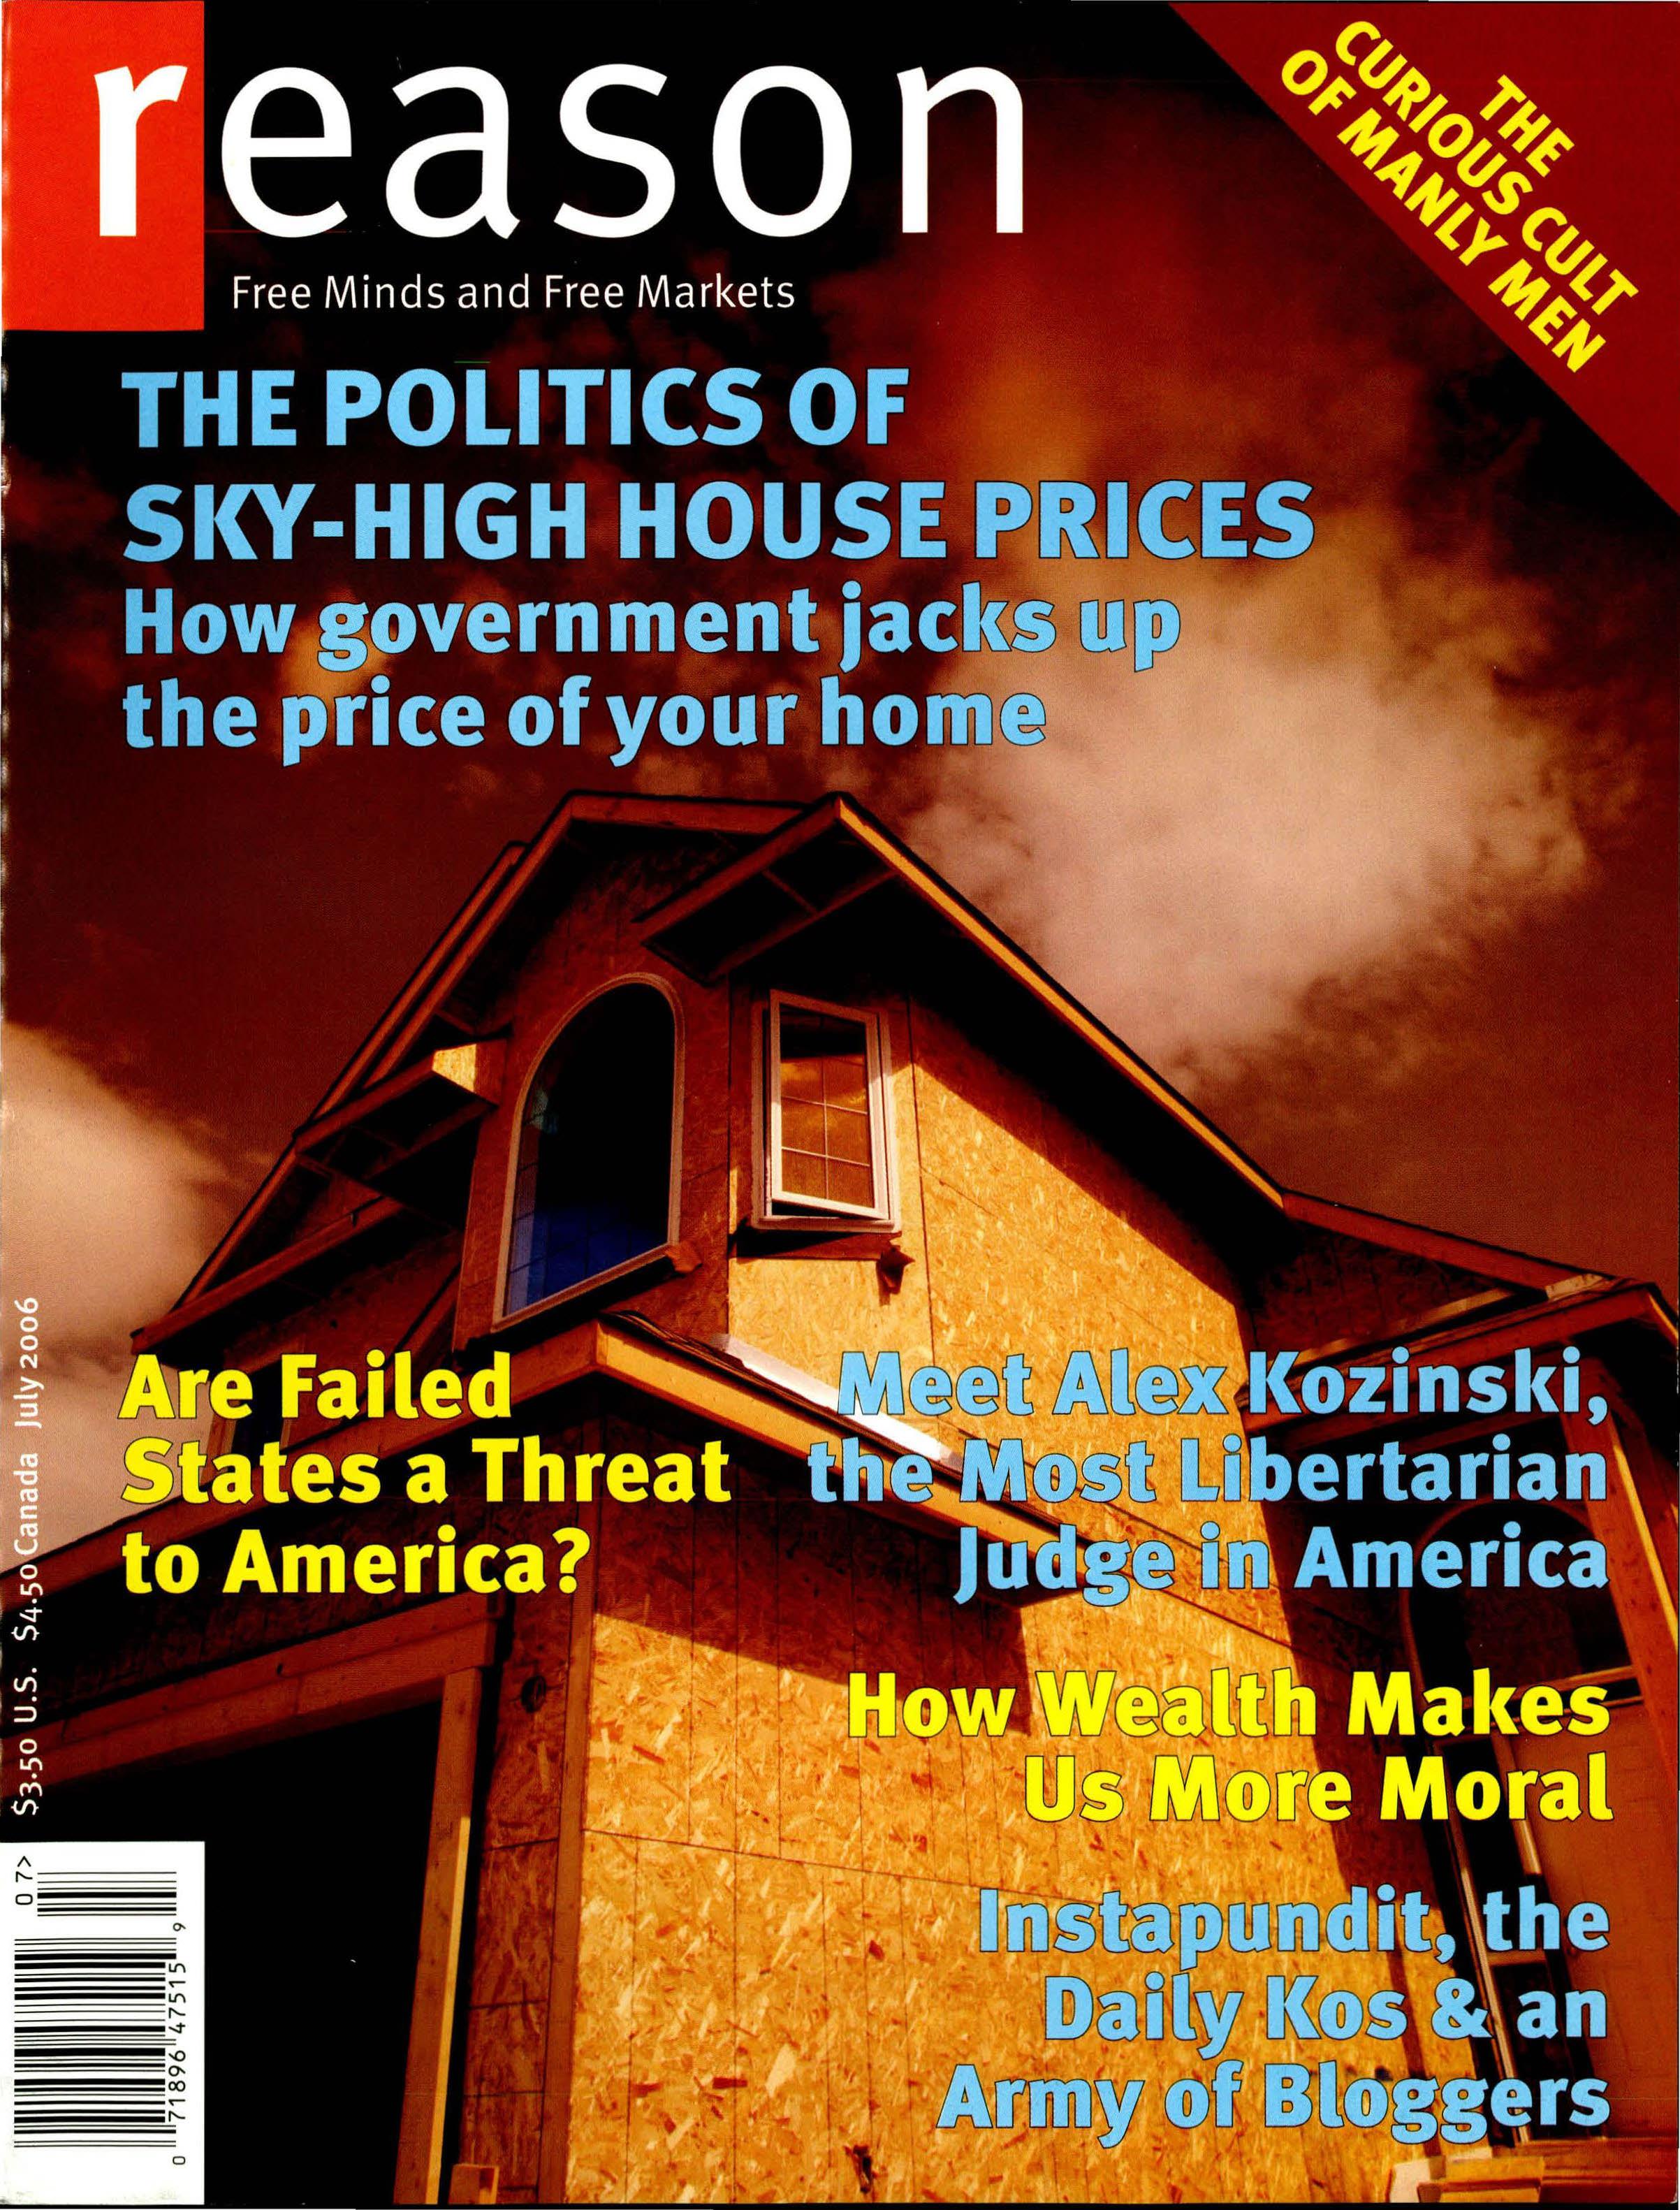 Reason Magazine, July 2006 cover image